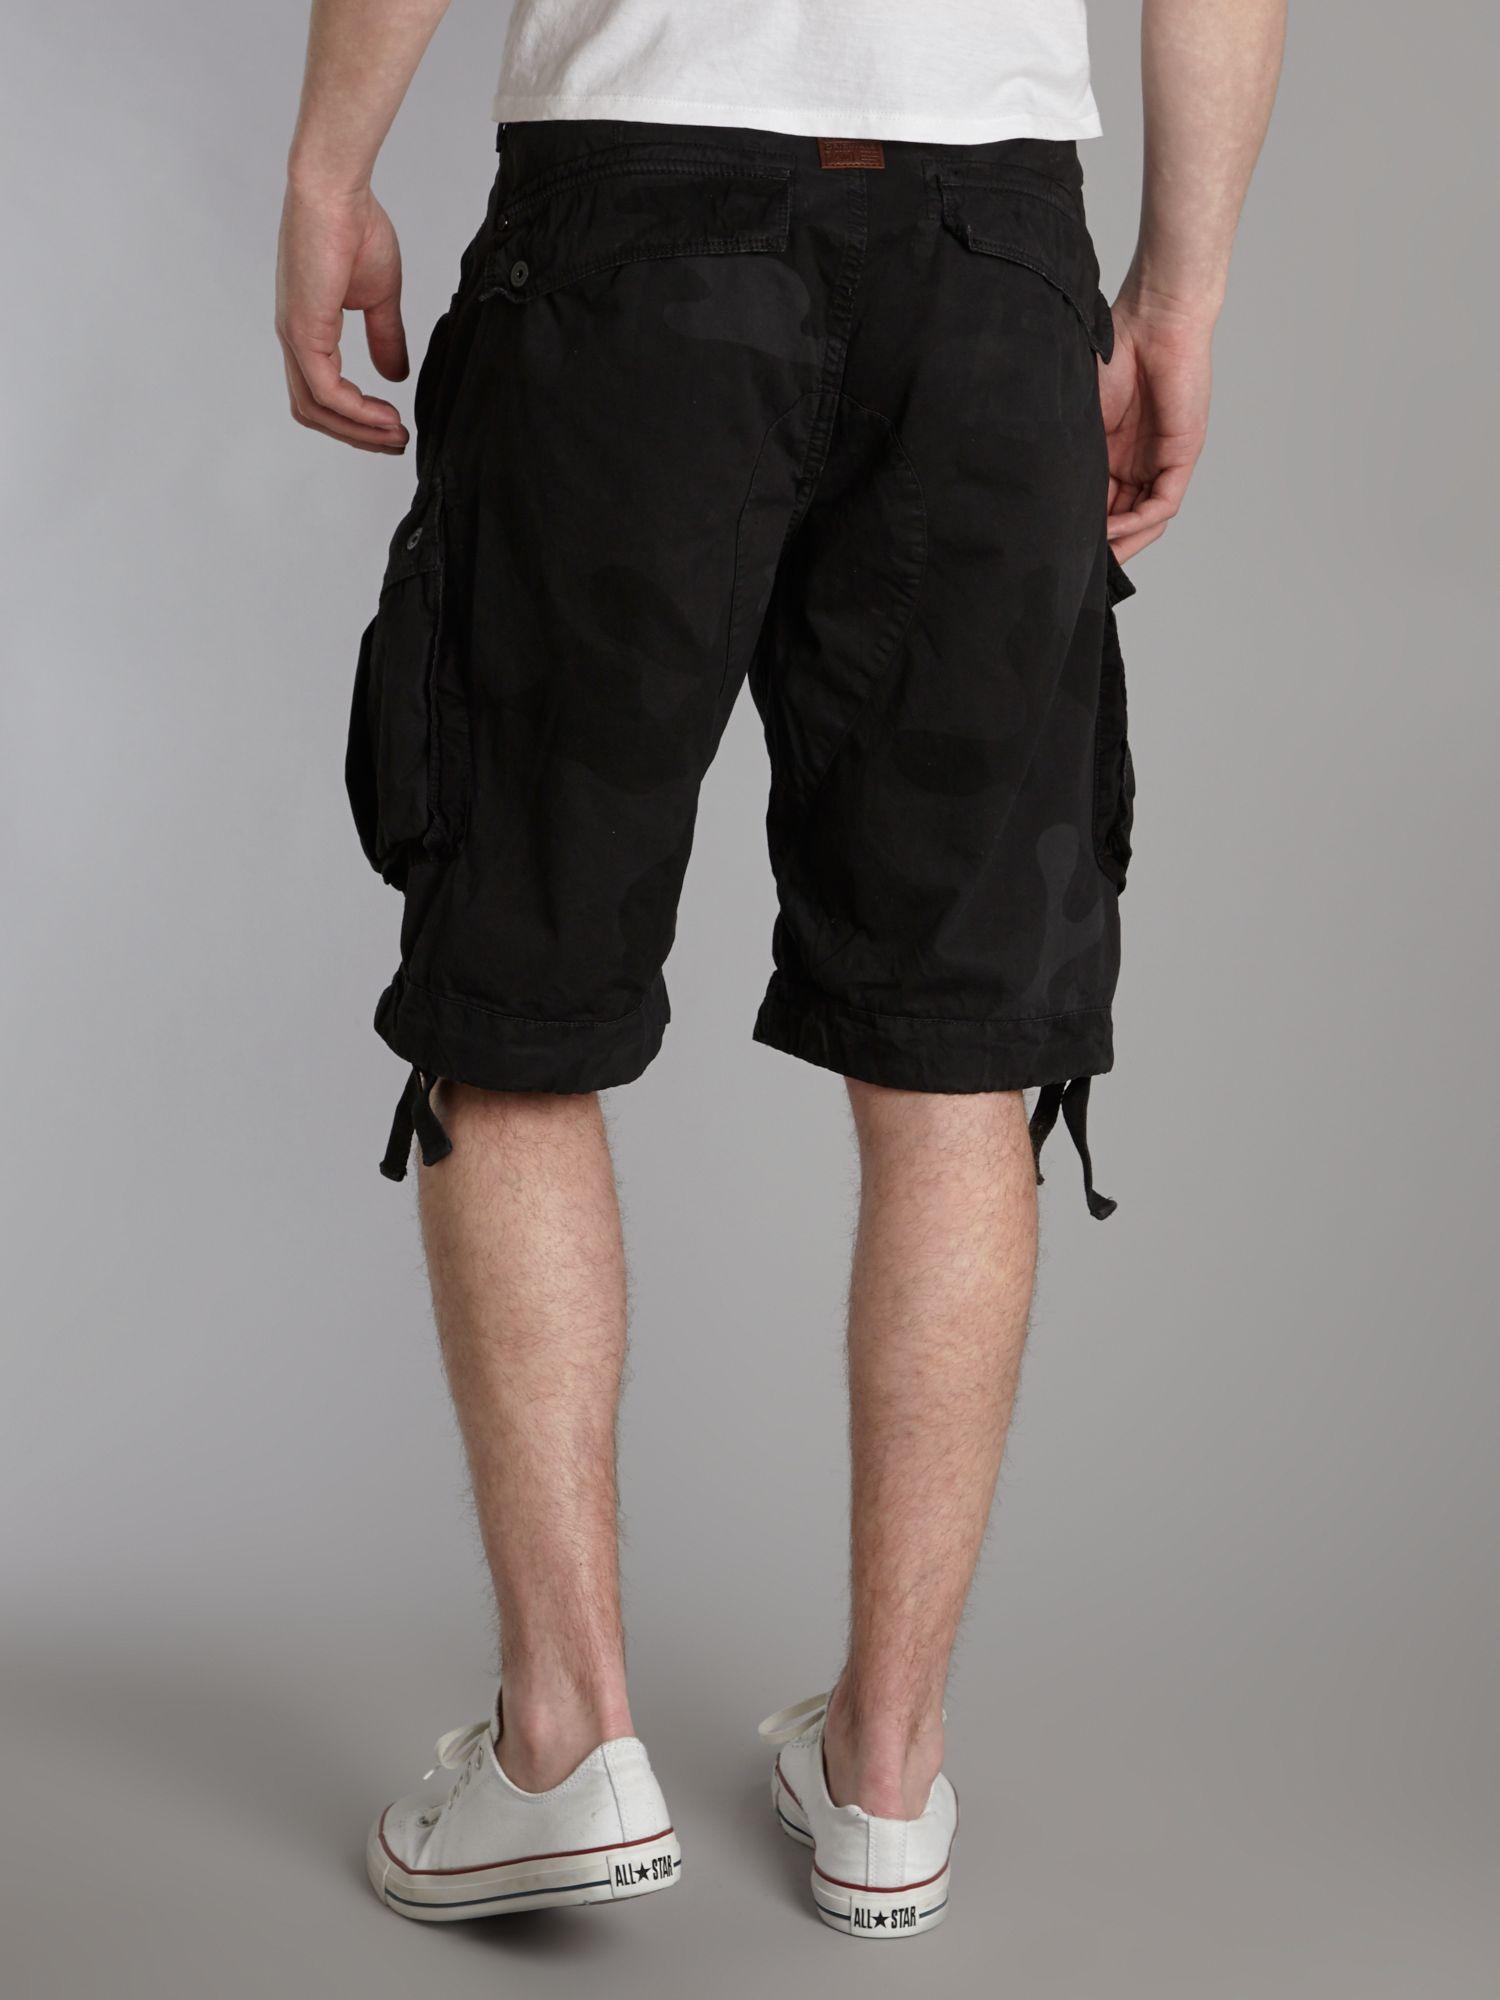 g star raw raw herren shorts rackam cargo 1 2 mehrfarbig. Black Bedroom Furniture Sets. Home Design Ideas